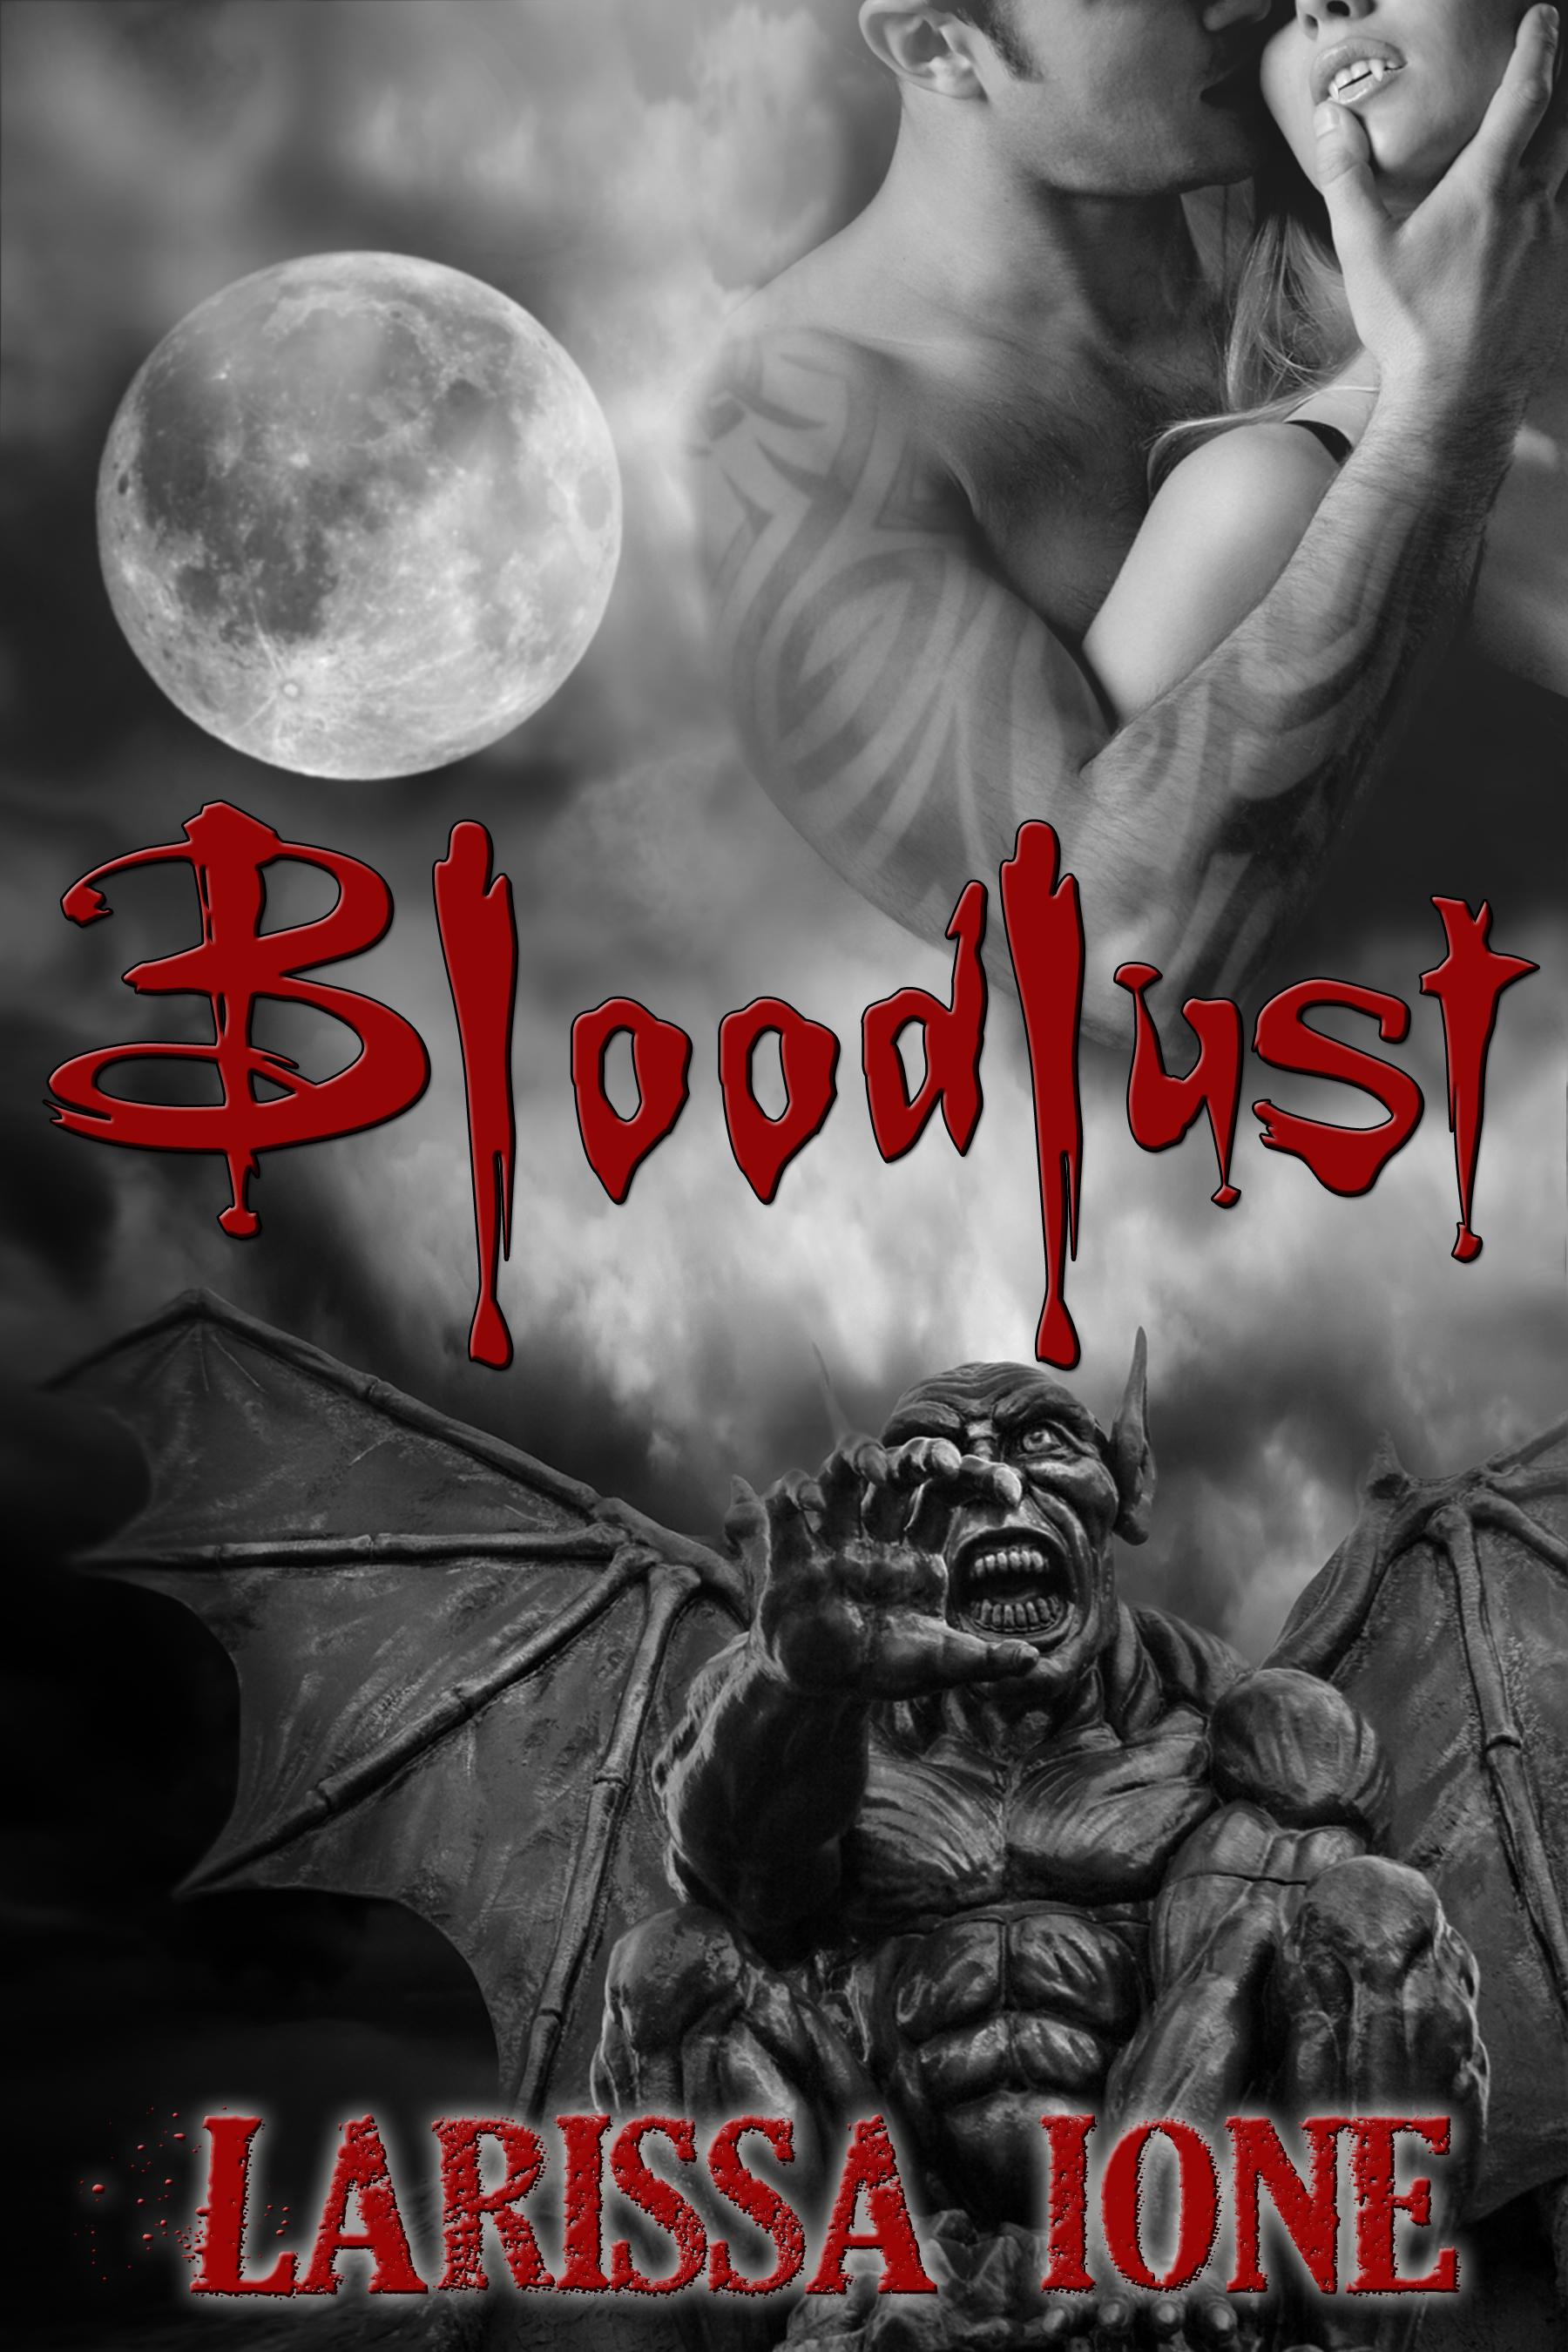 Larissa Ione - Bloodlust